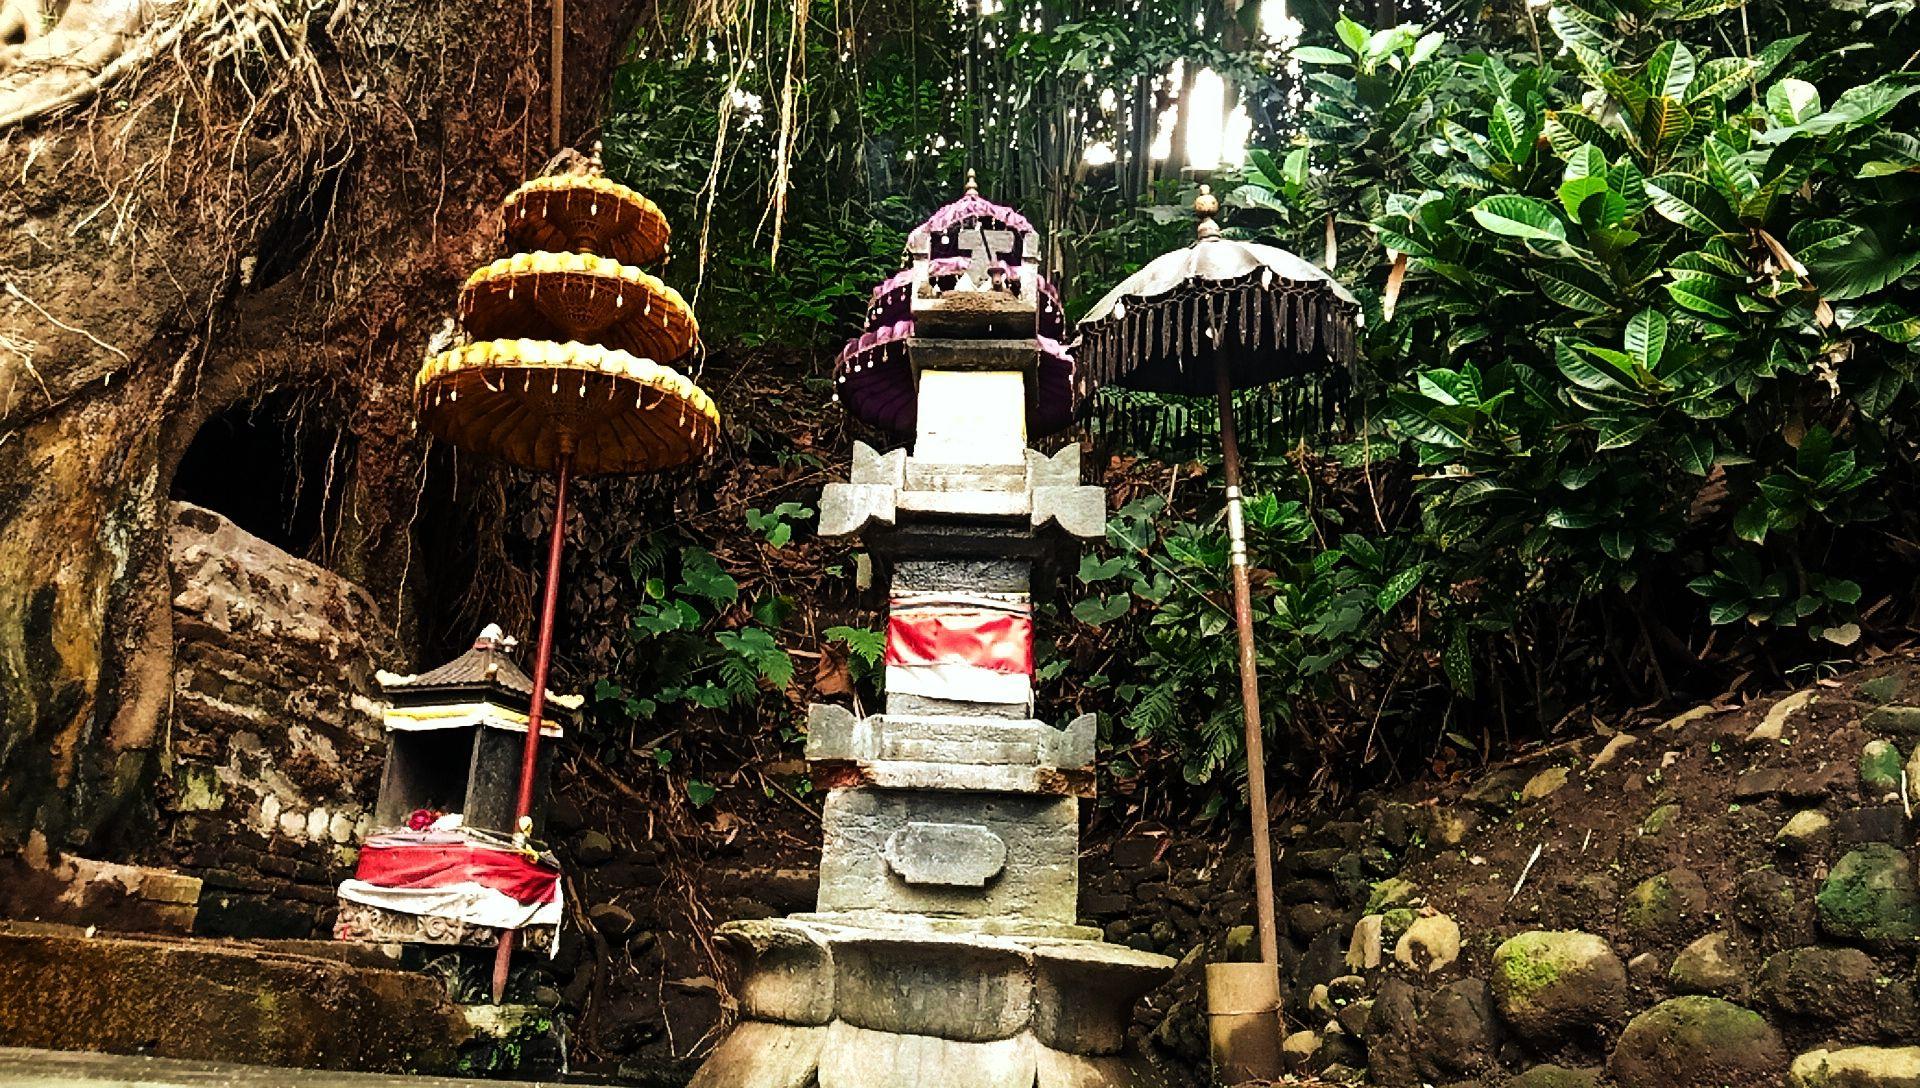 Petirtaan Watu Gede di Dusun Sanan, Kelurahan Watugede, Kecamatan Singosari, Kabupaten Malang. (Foto: Ovi/Gufron/Tugu Jatim)